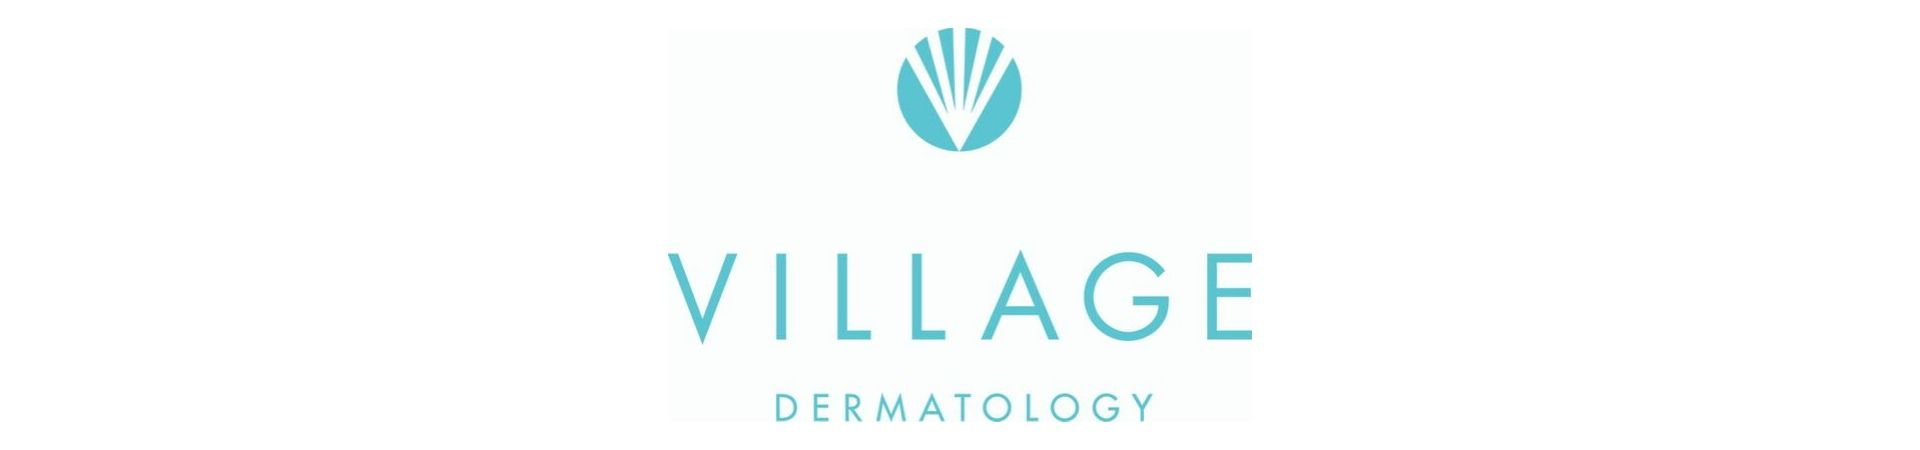 Village Dermatology Logo